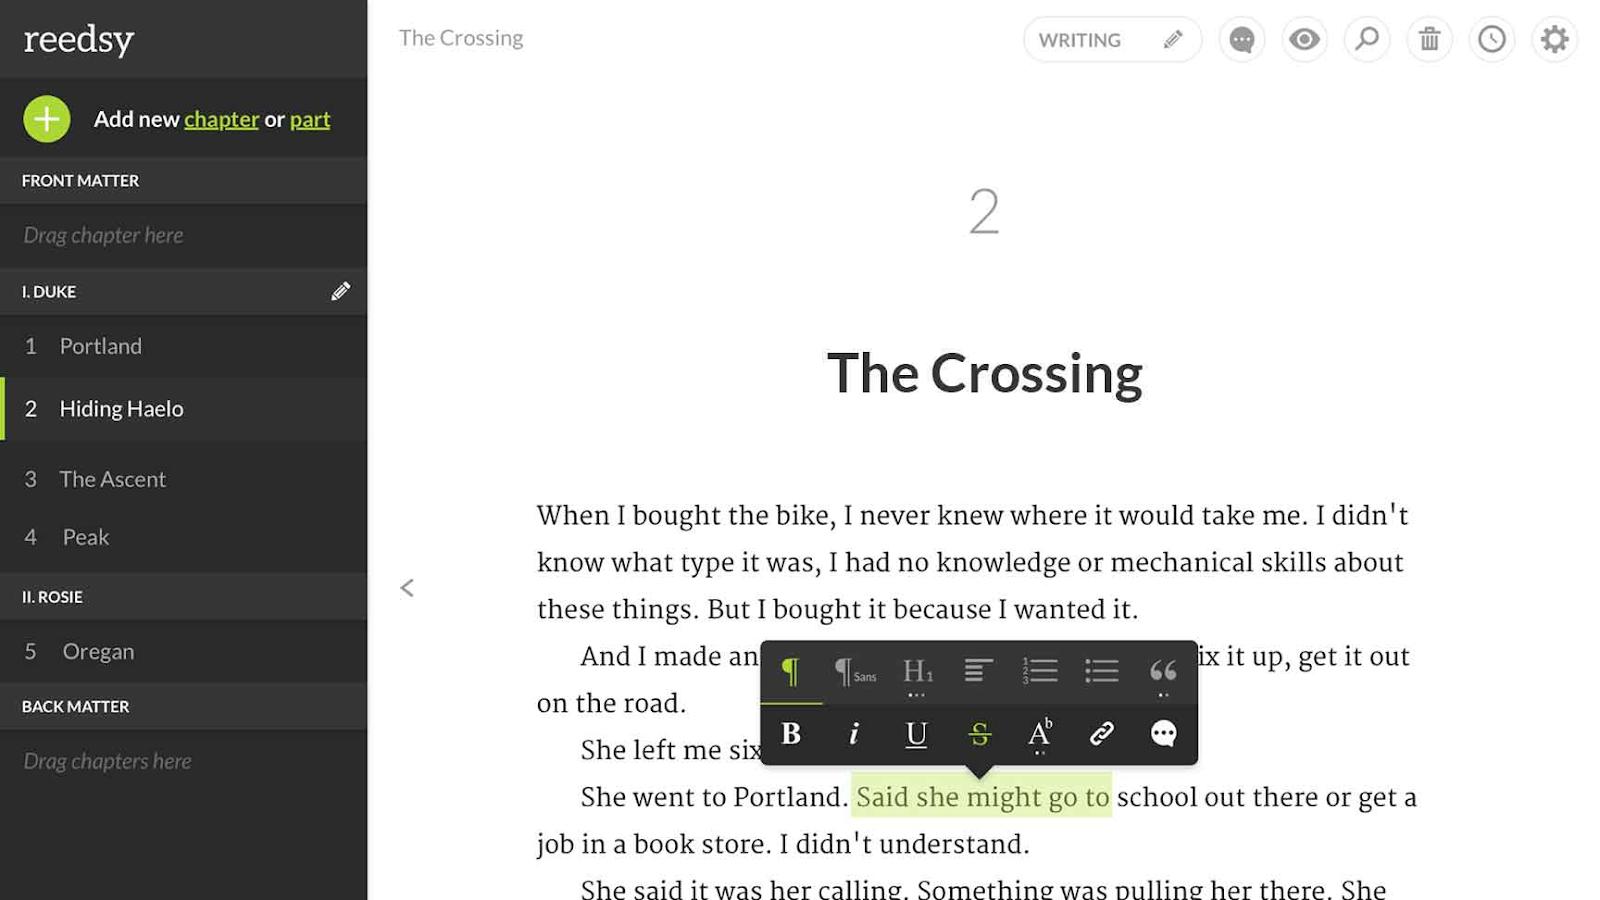 screenshot of Reedsy app user interface